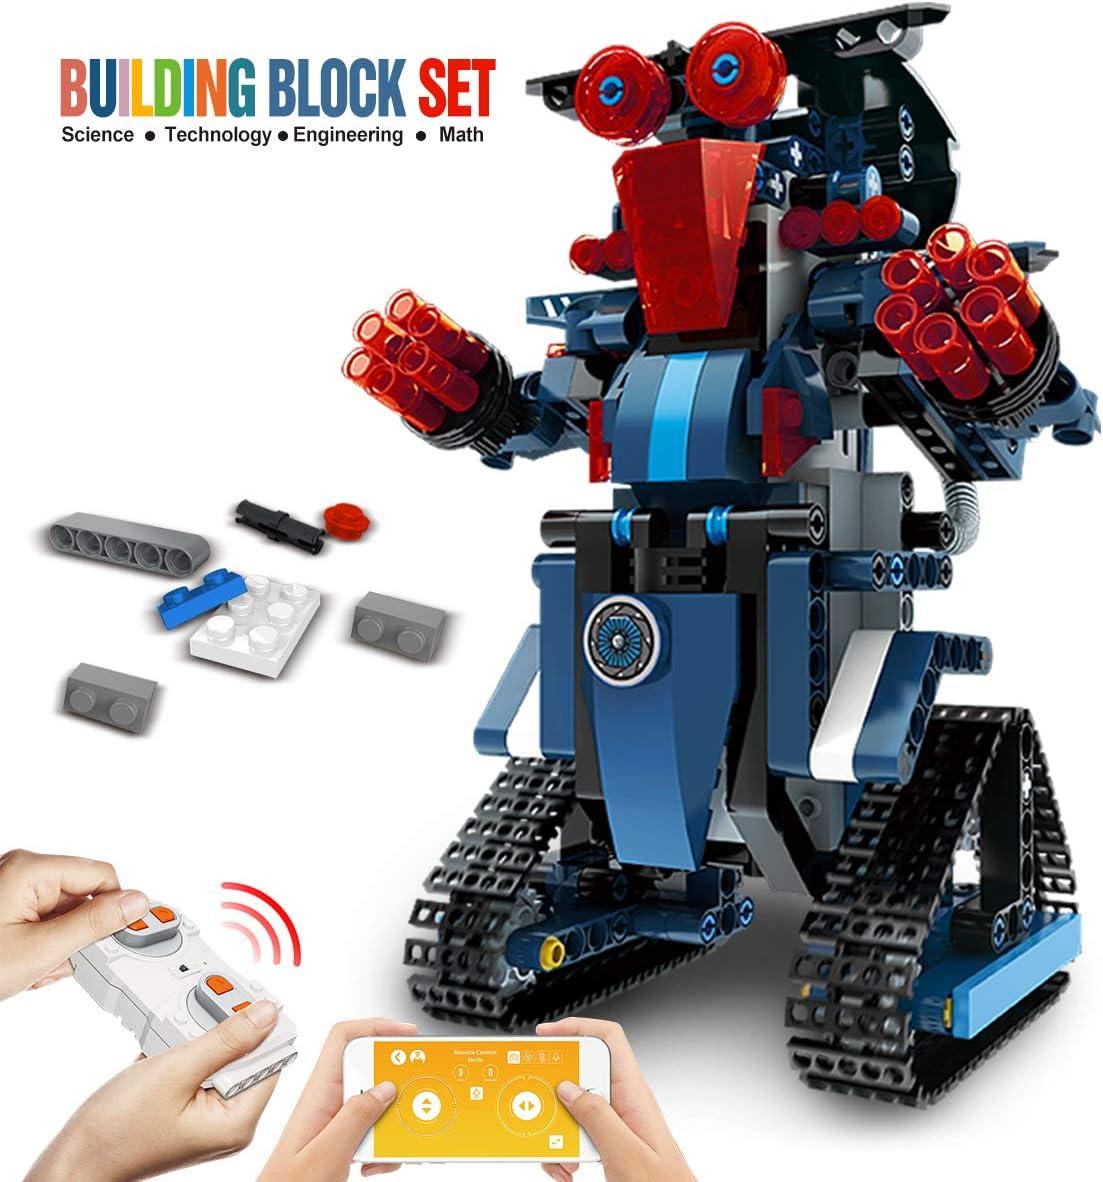 Purple DAZHONG Remote Control Robot STEM Application Building Block Robot Education kit Remote Control Engineering Science Education Building Toy boy Girl Learning Smart Gift